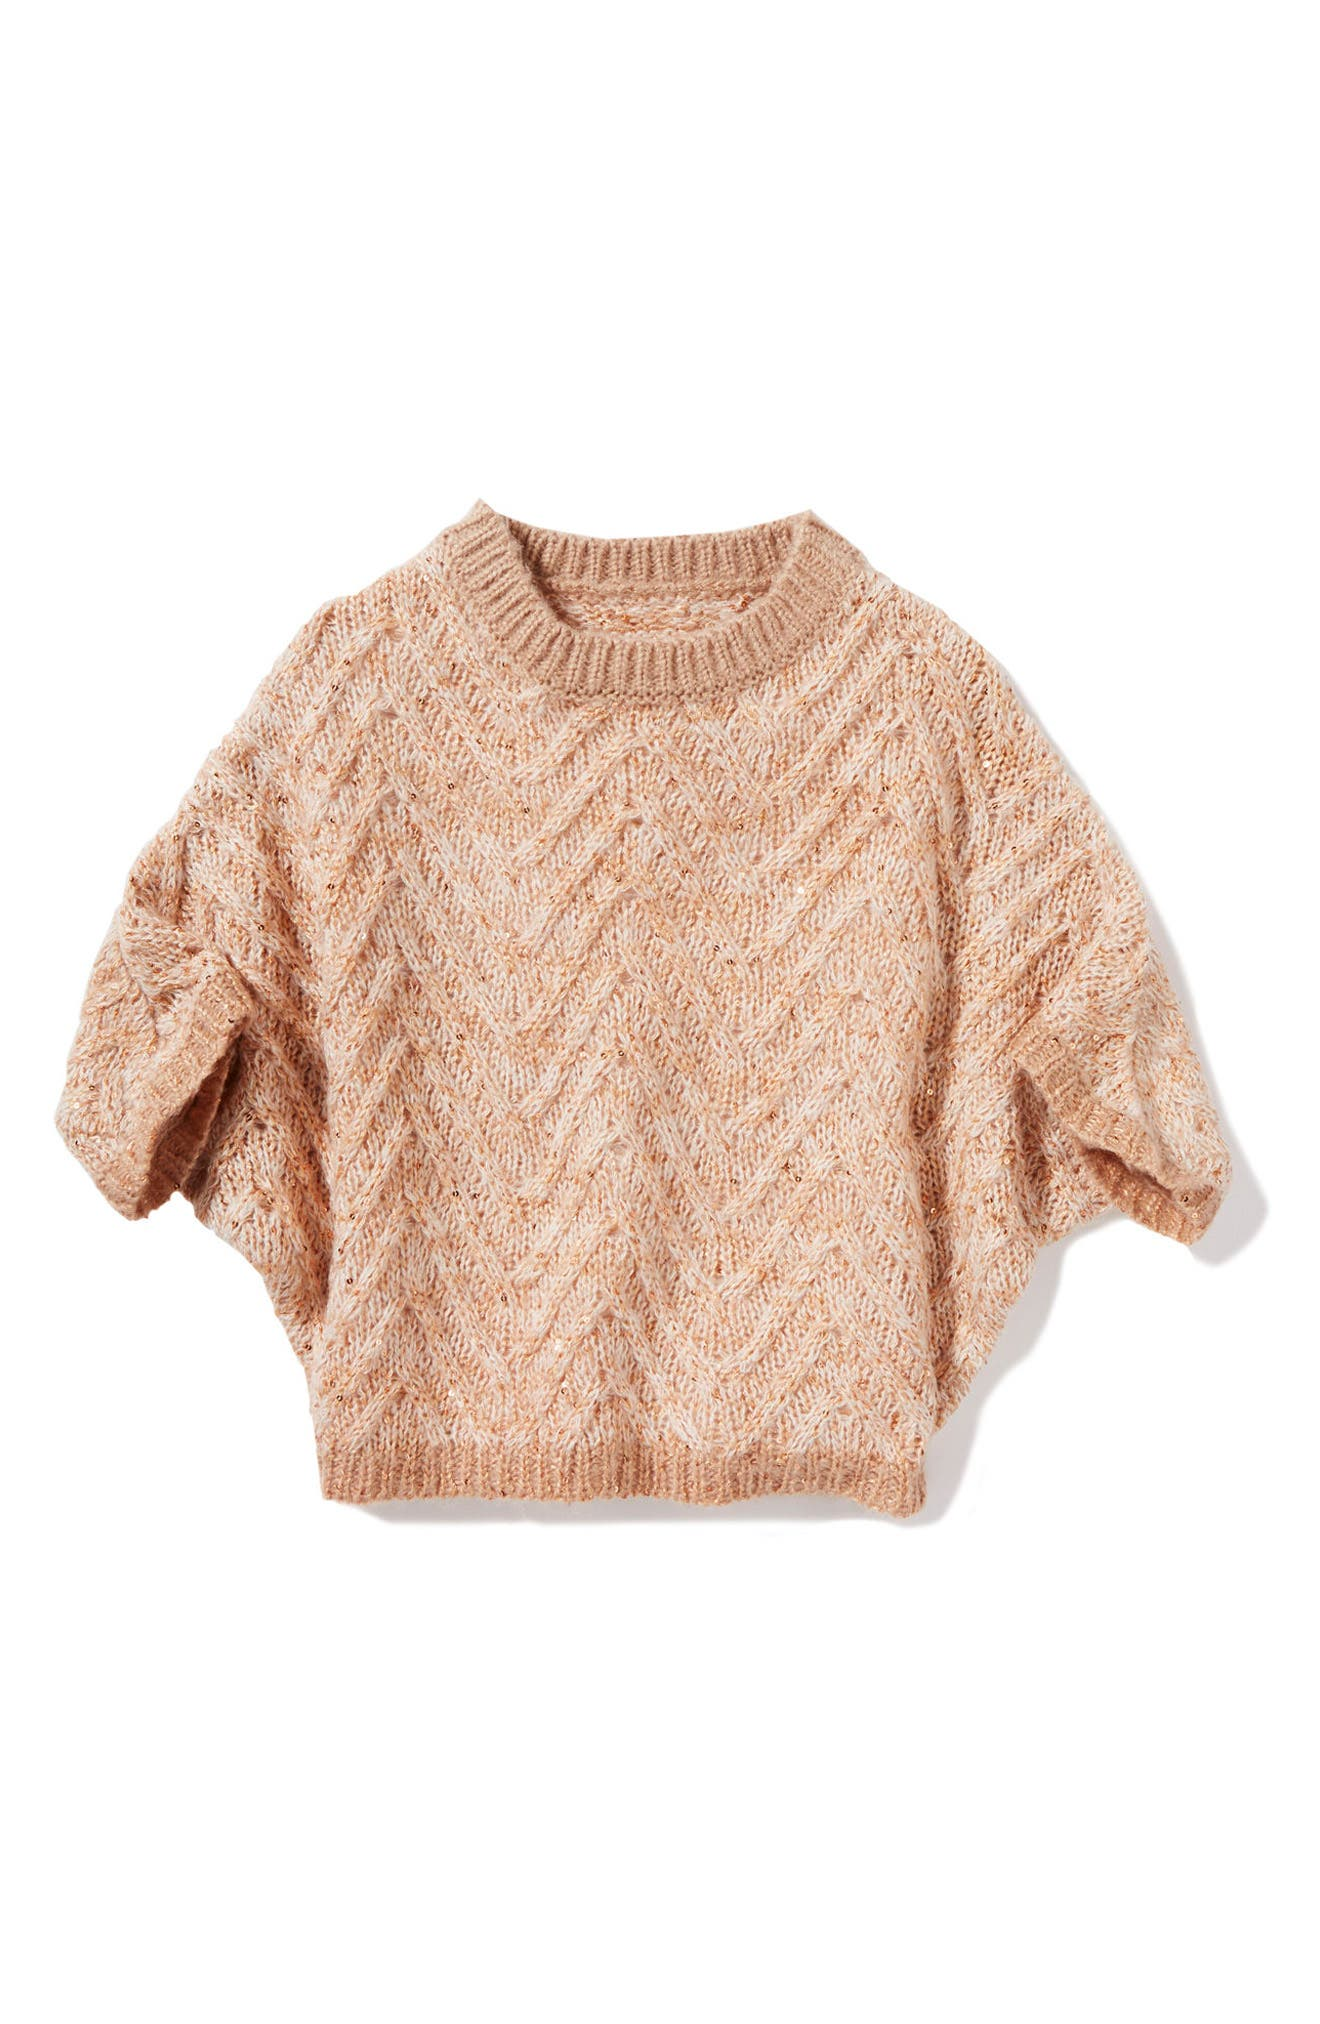 Alternate Image 1 Selected - Peek Olivia Chevron Stripe Sweater (Toddler Girls, Little Girls & Big Girls)